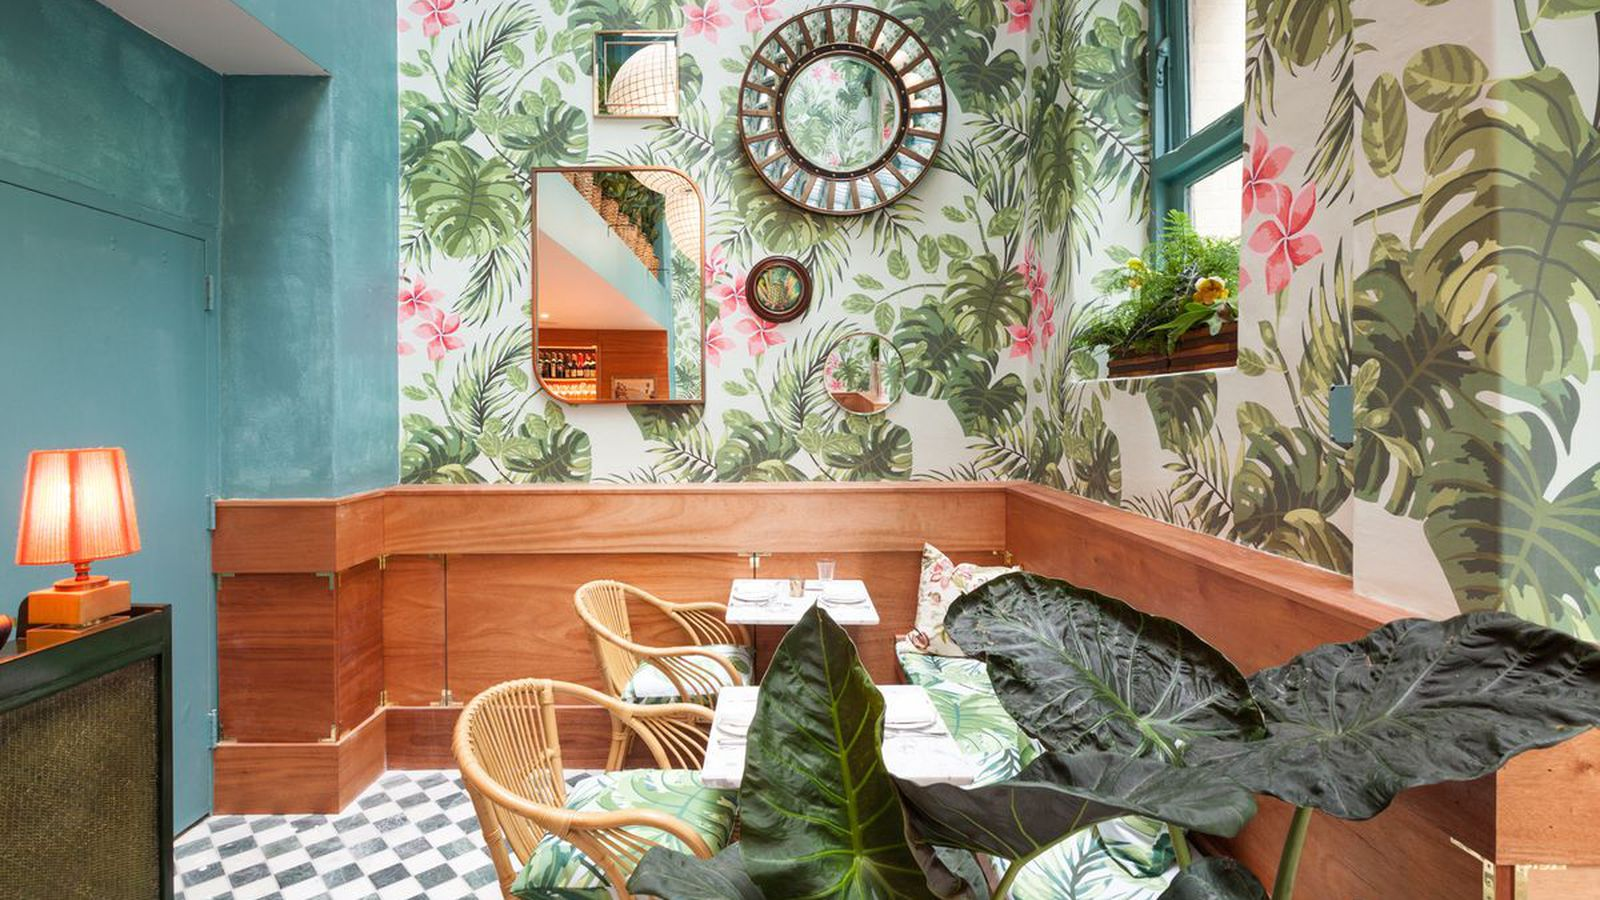 Interior design star ken fulk nabs prestigious food award